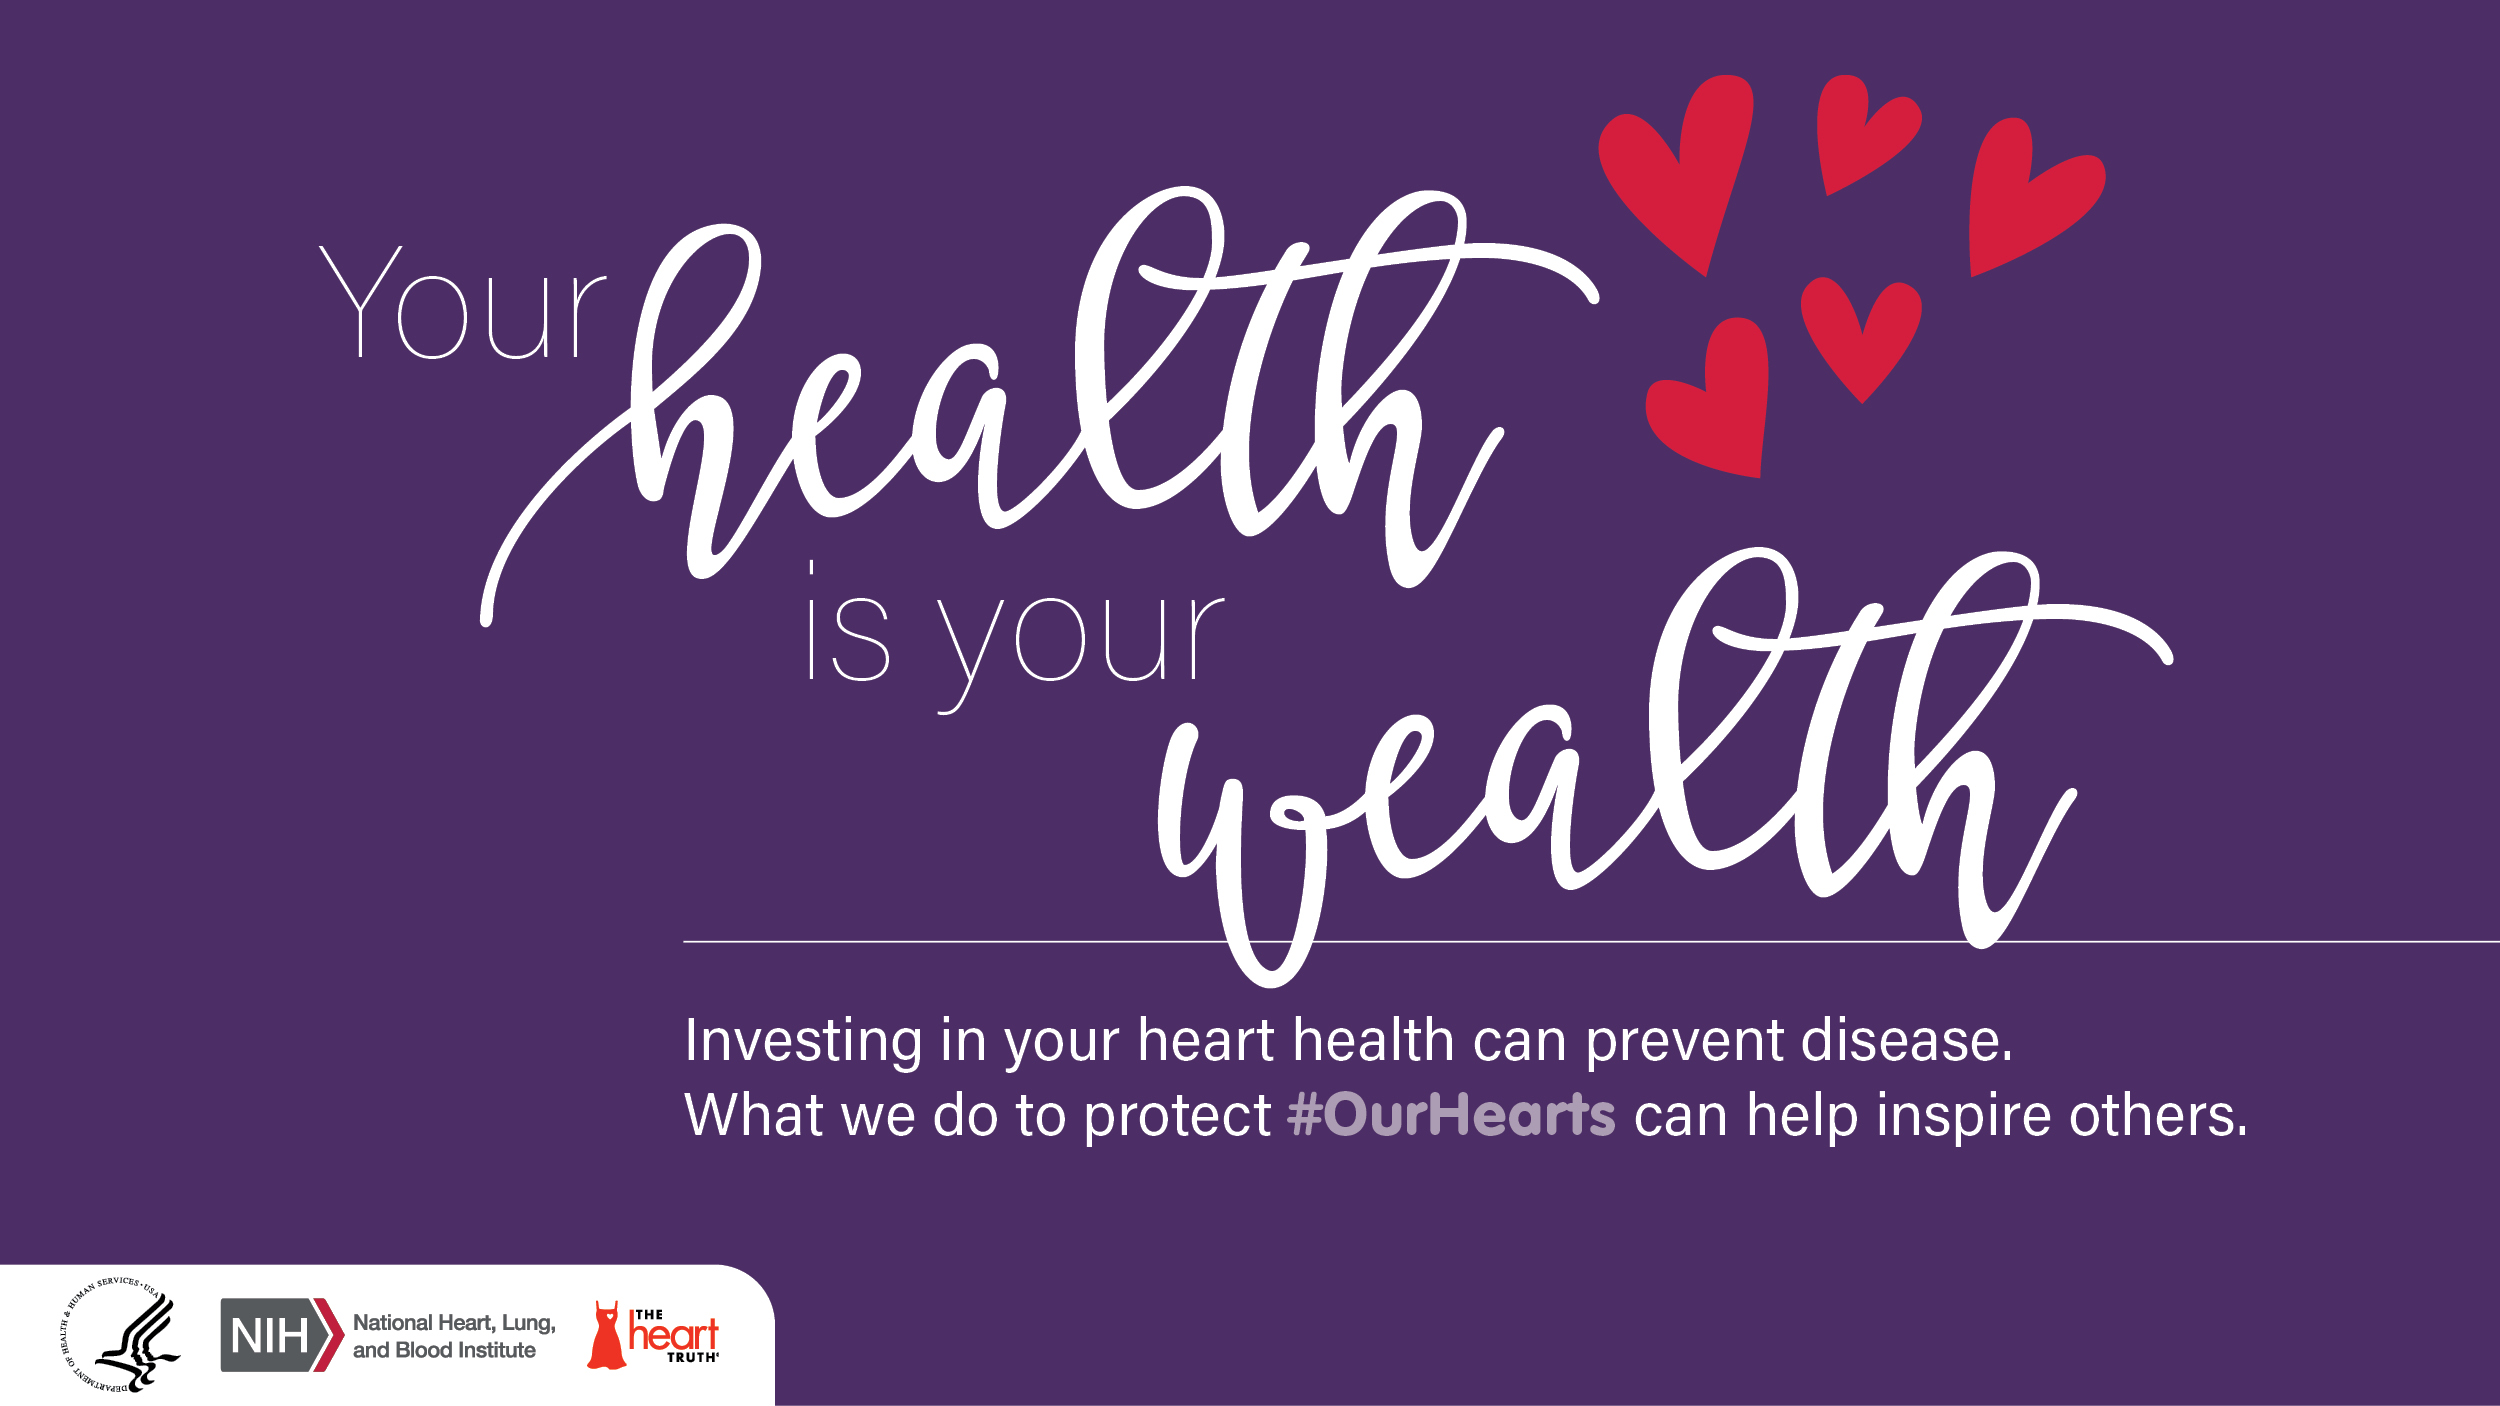 HealthisWealth